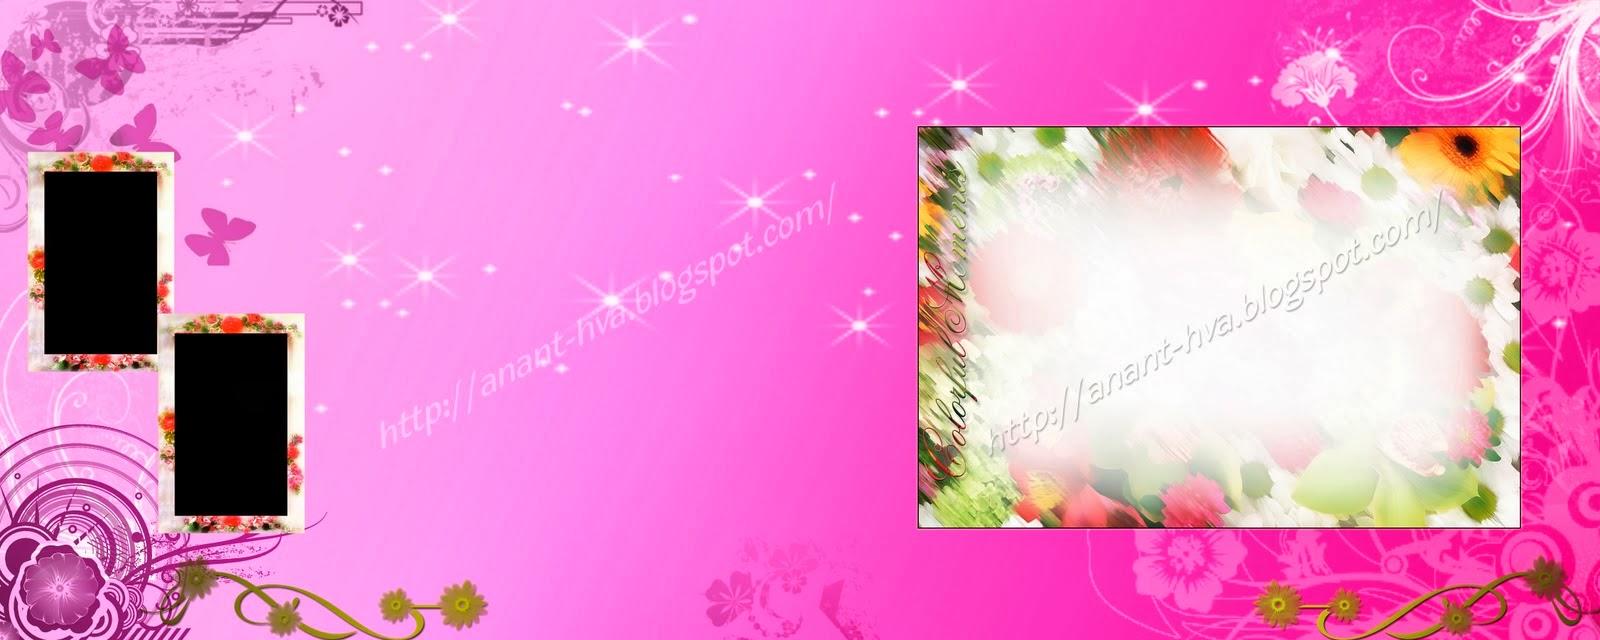 Karizma Album Background - Luckystudio4u